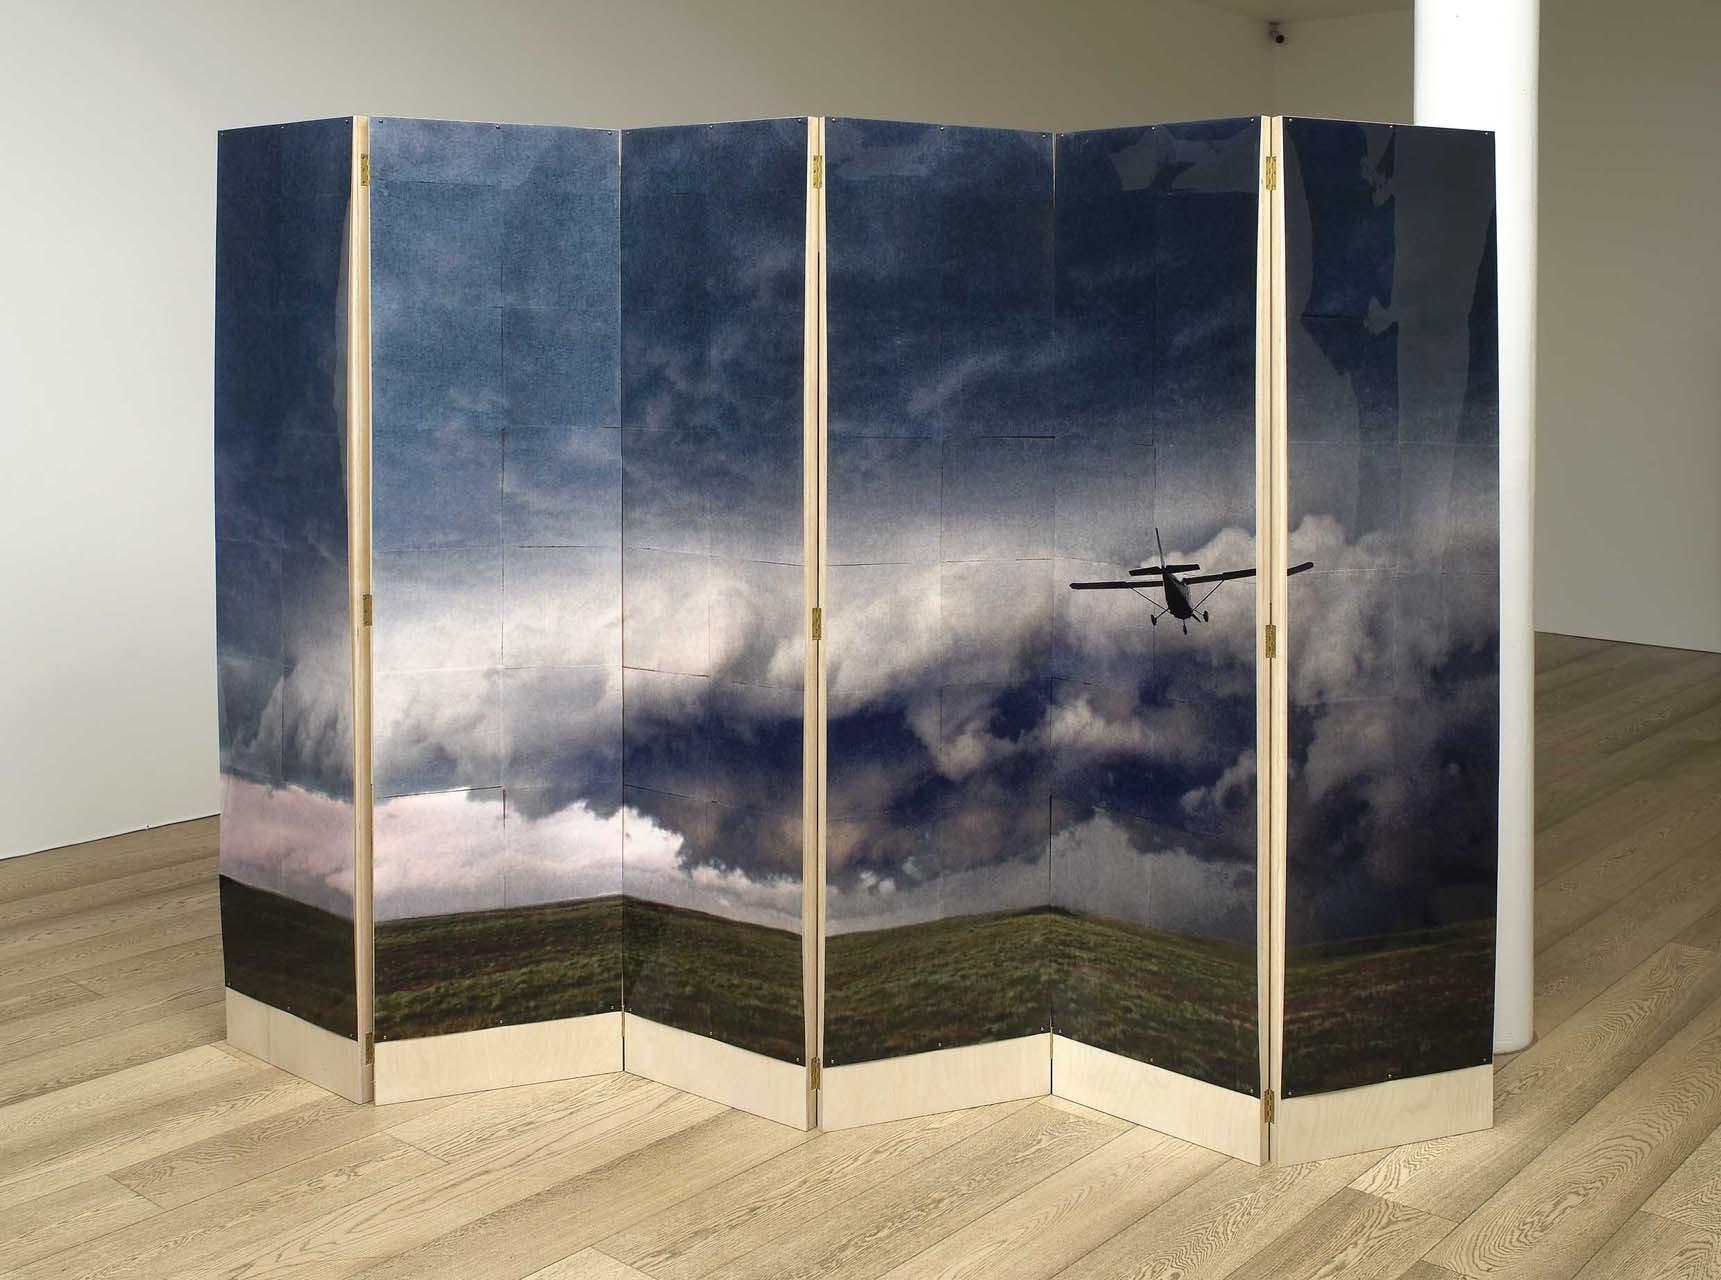 "<div class=""artwork_caption""><p>Patsy's Flight (large), 2010</p></div>"